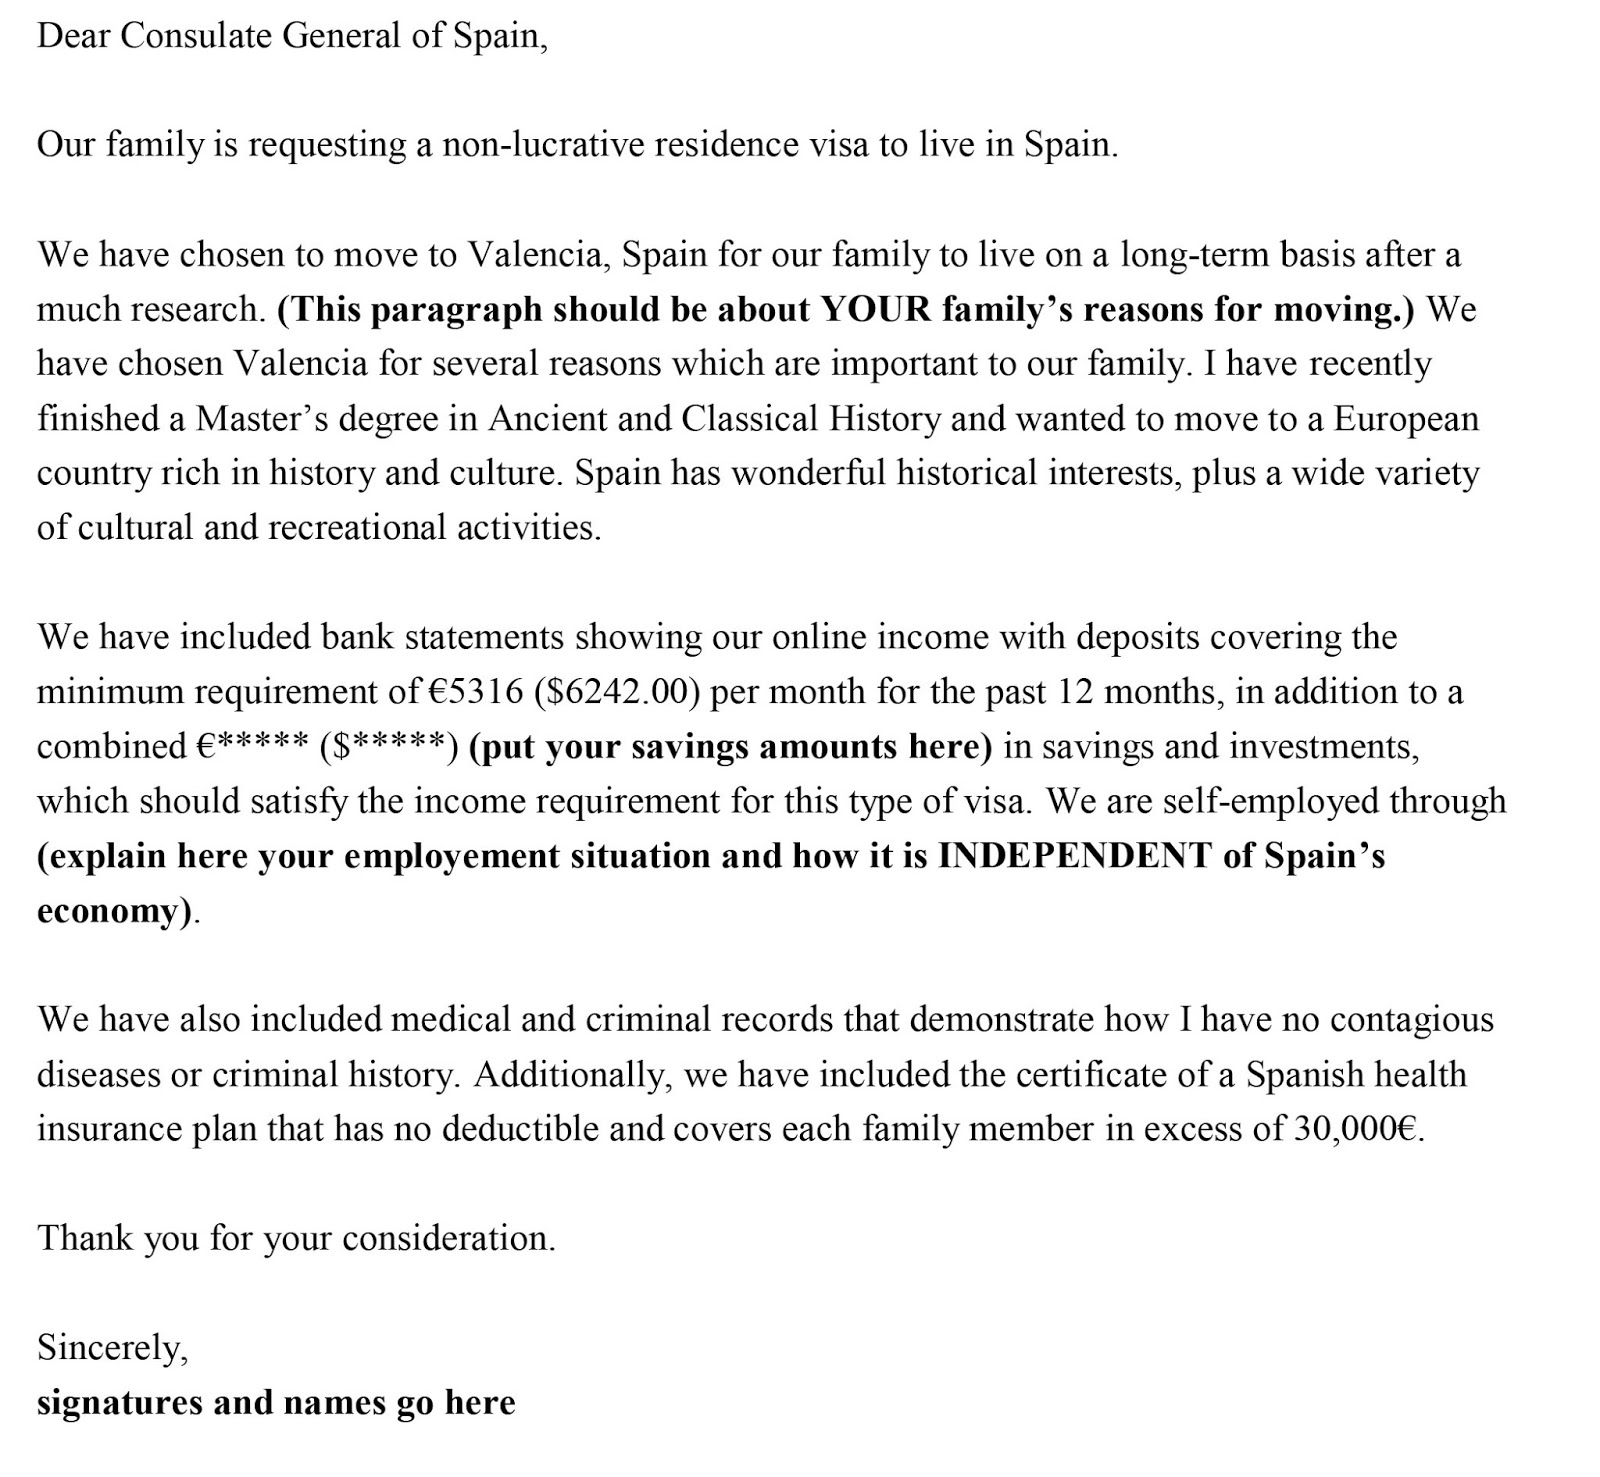 Insurance Letter Of Intent from 1.bp.blogspot.com